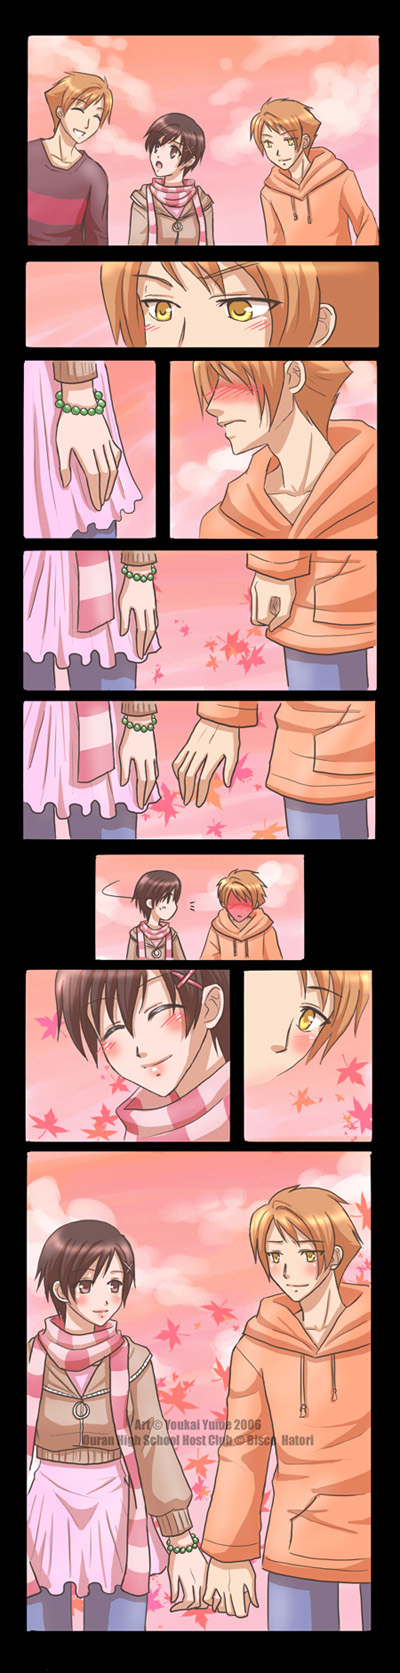 Tags: Anime, Youkai Yume, Ouran High School Host Club, Hitachiin Kaoru, Fujioka Haruhi, Hitachiin Hikaru, deviantART, Comic